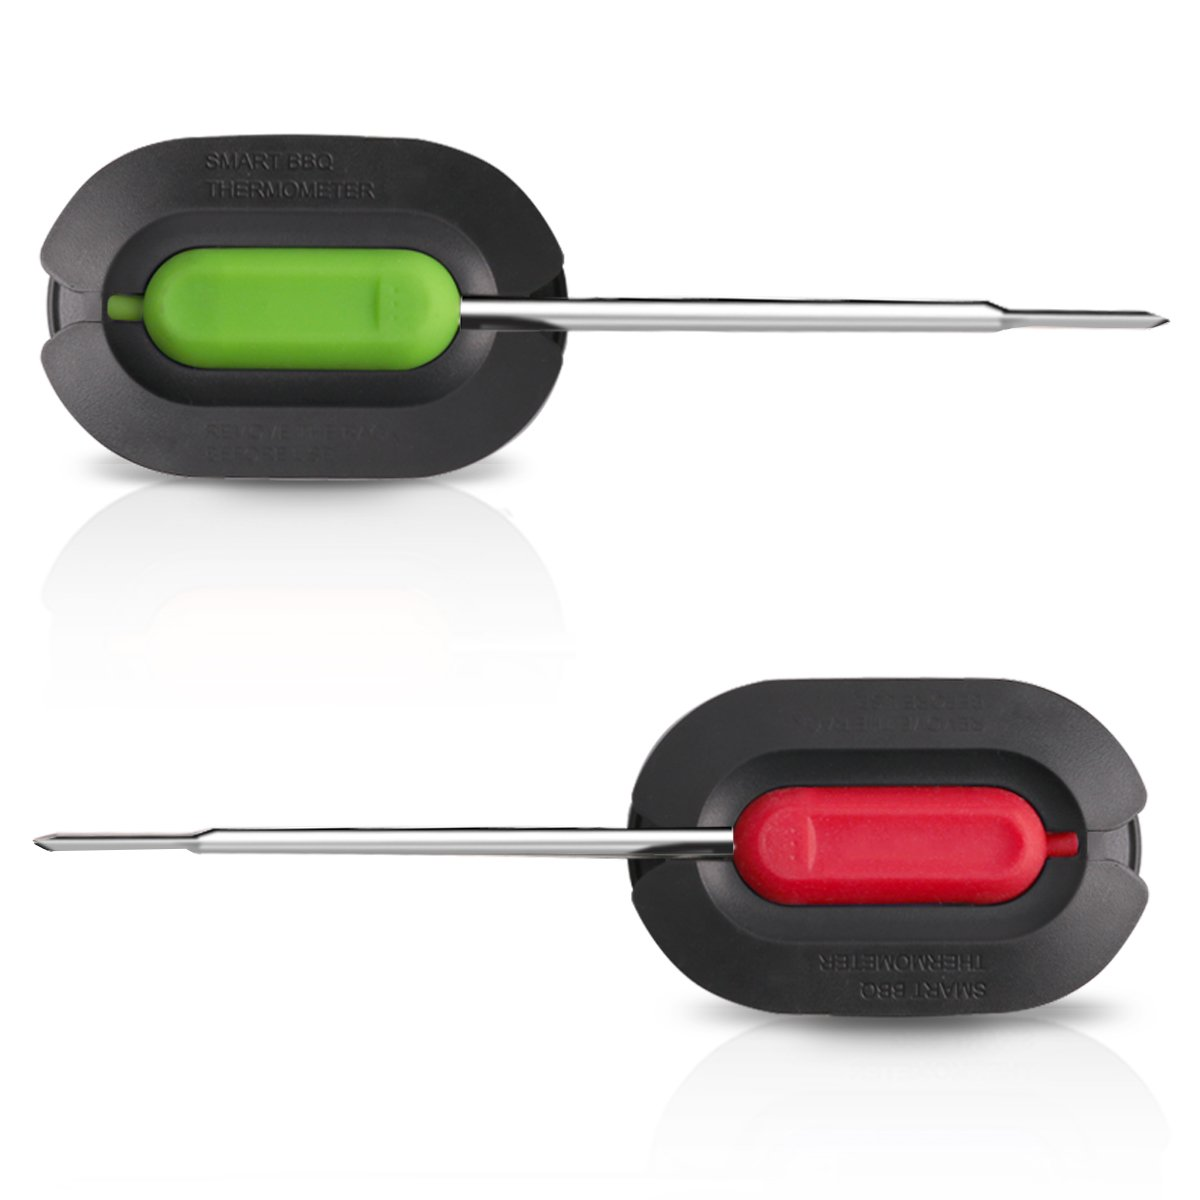 Soraken Stainless Steel Probe for Thermometer (green-red)